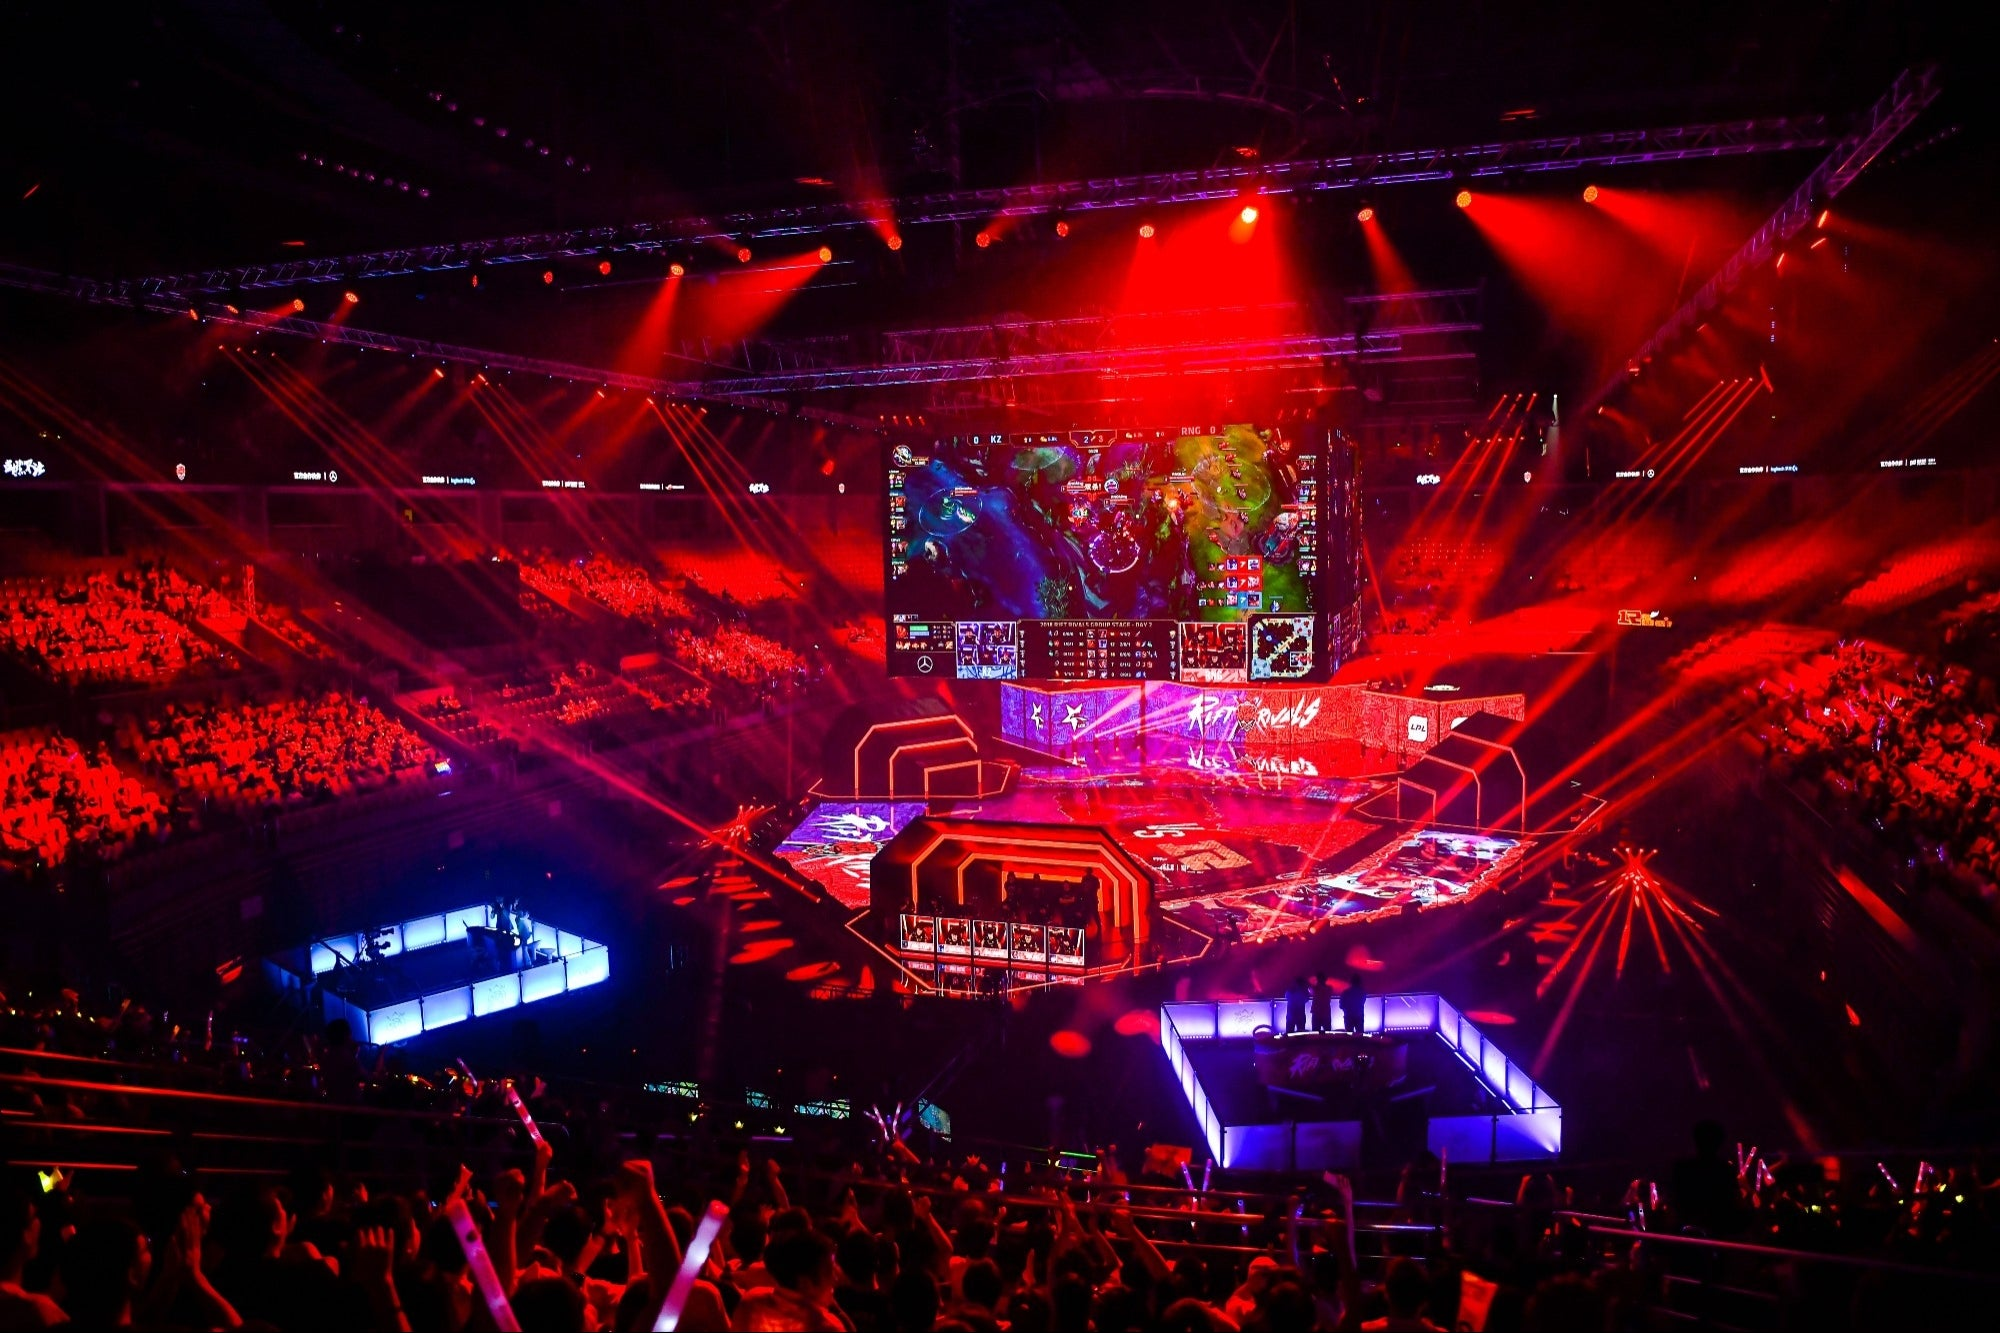 entrepreneur.com - Entrepreneur en Español - The 5 most important eSports events of 2021